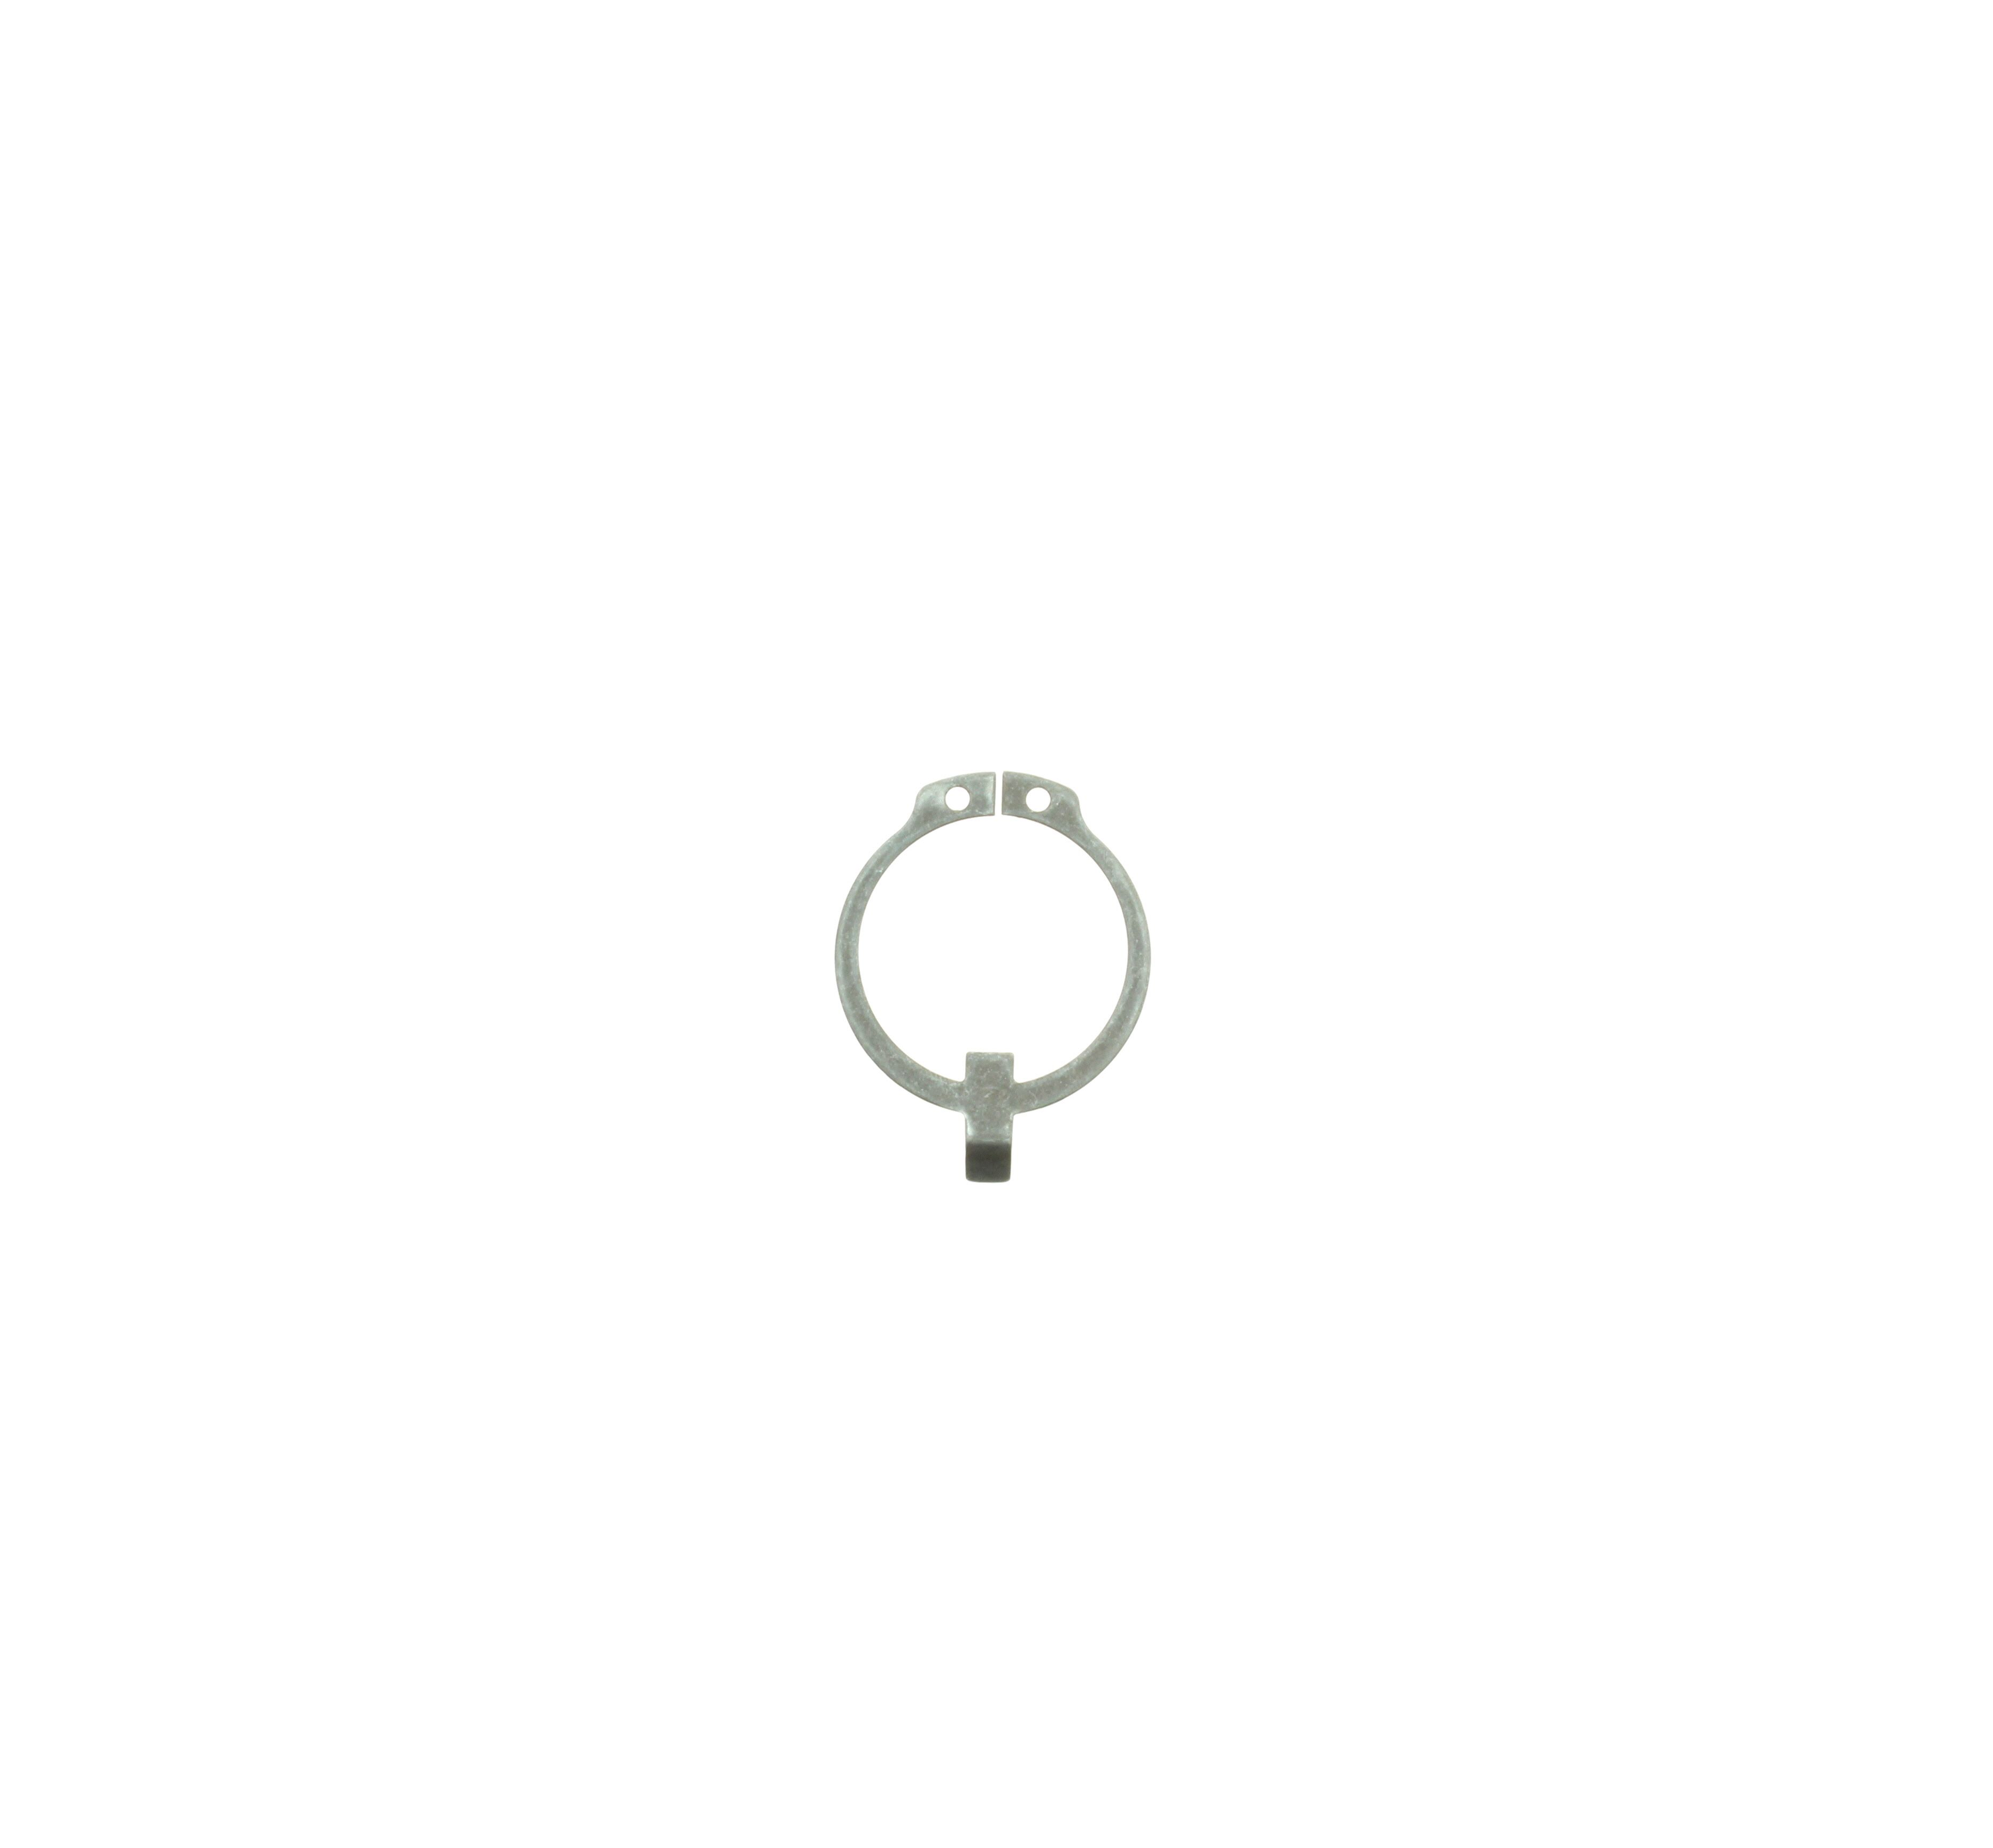 MASSEY FERGUSON TRACTOR SEGMENT (AGCO) 3426957M1